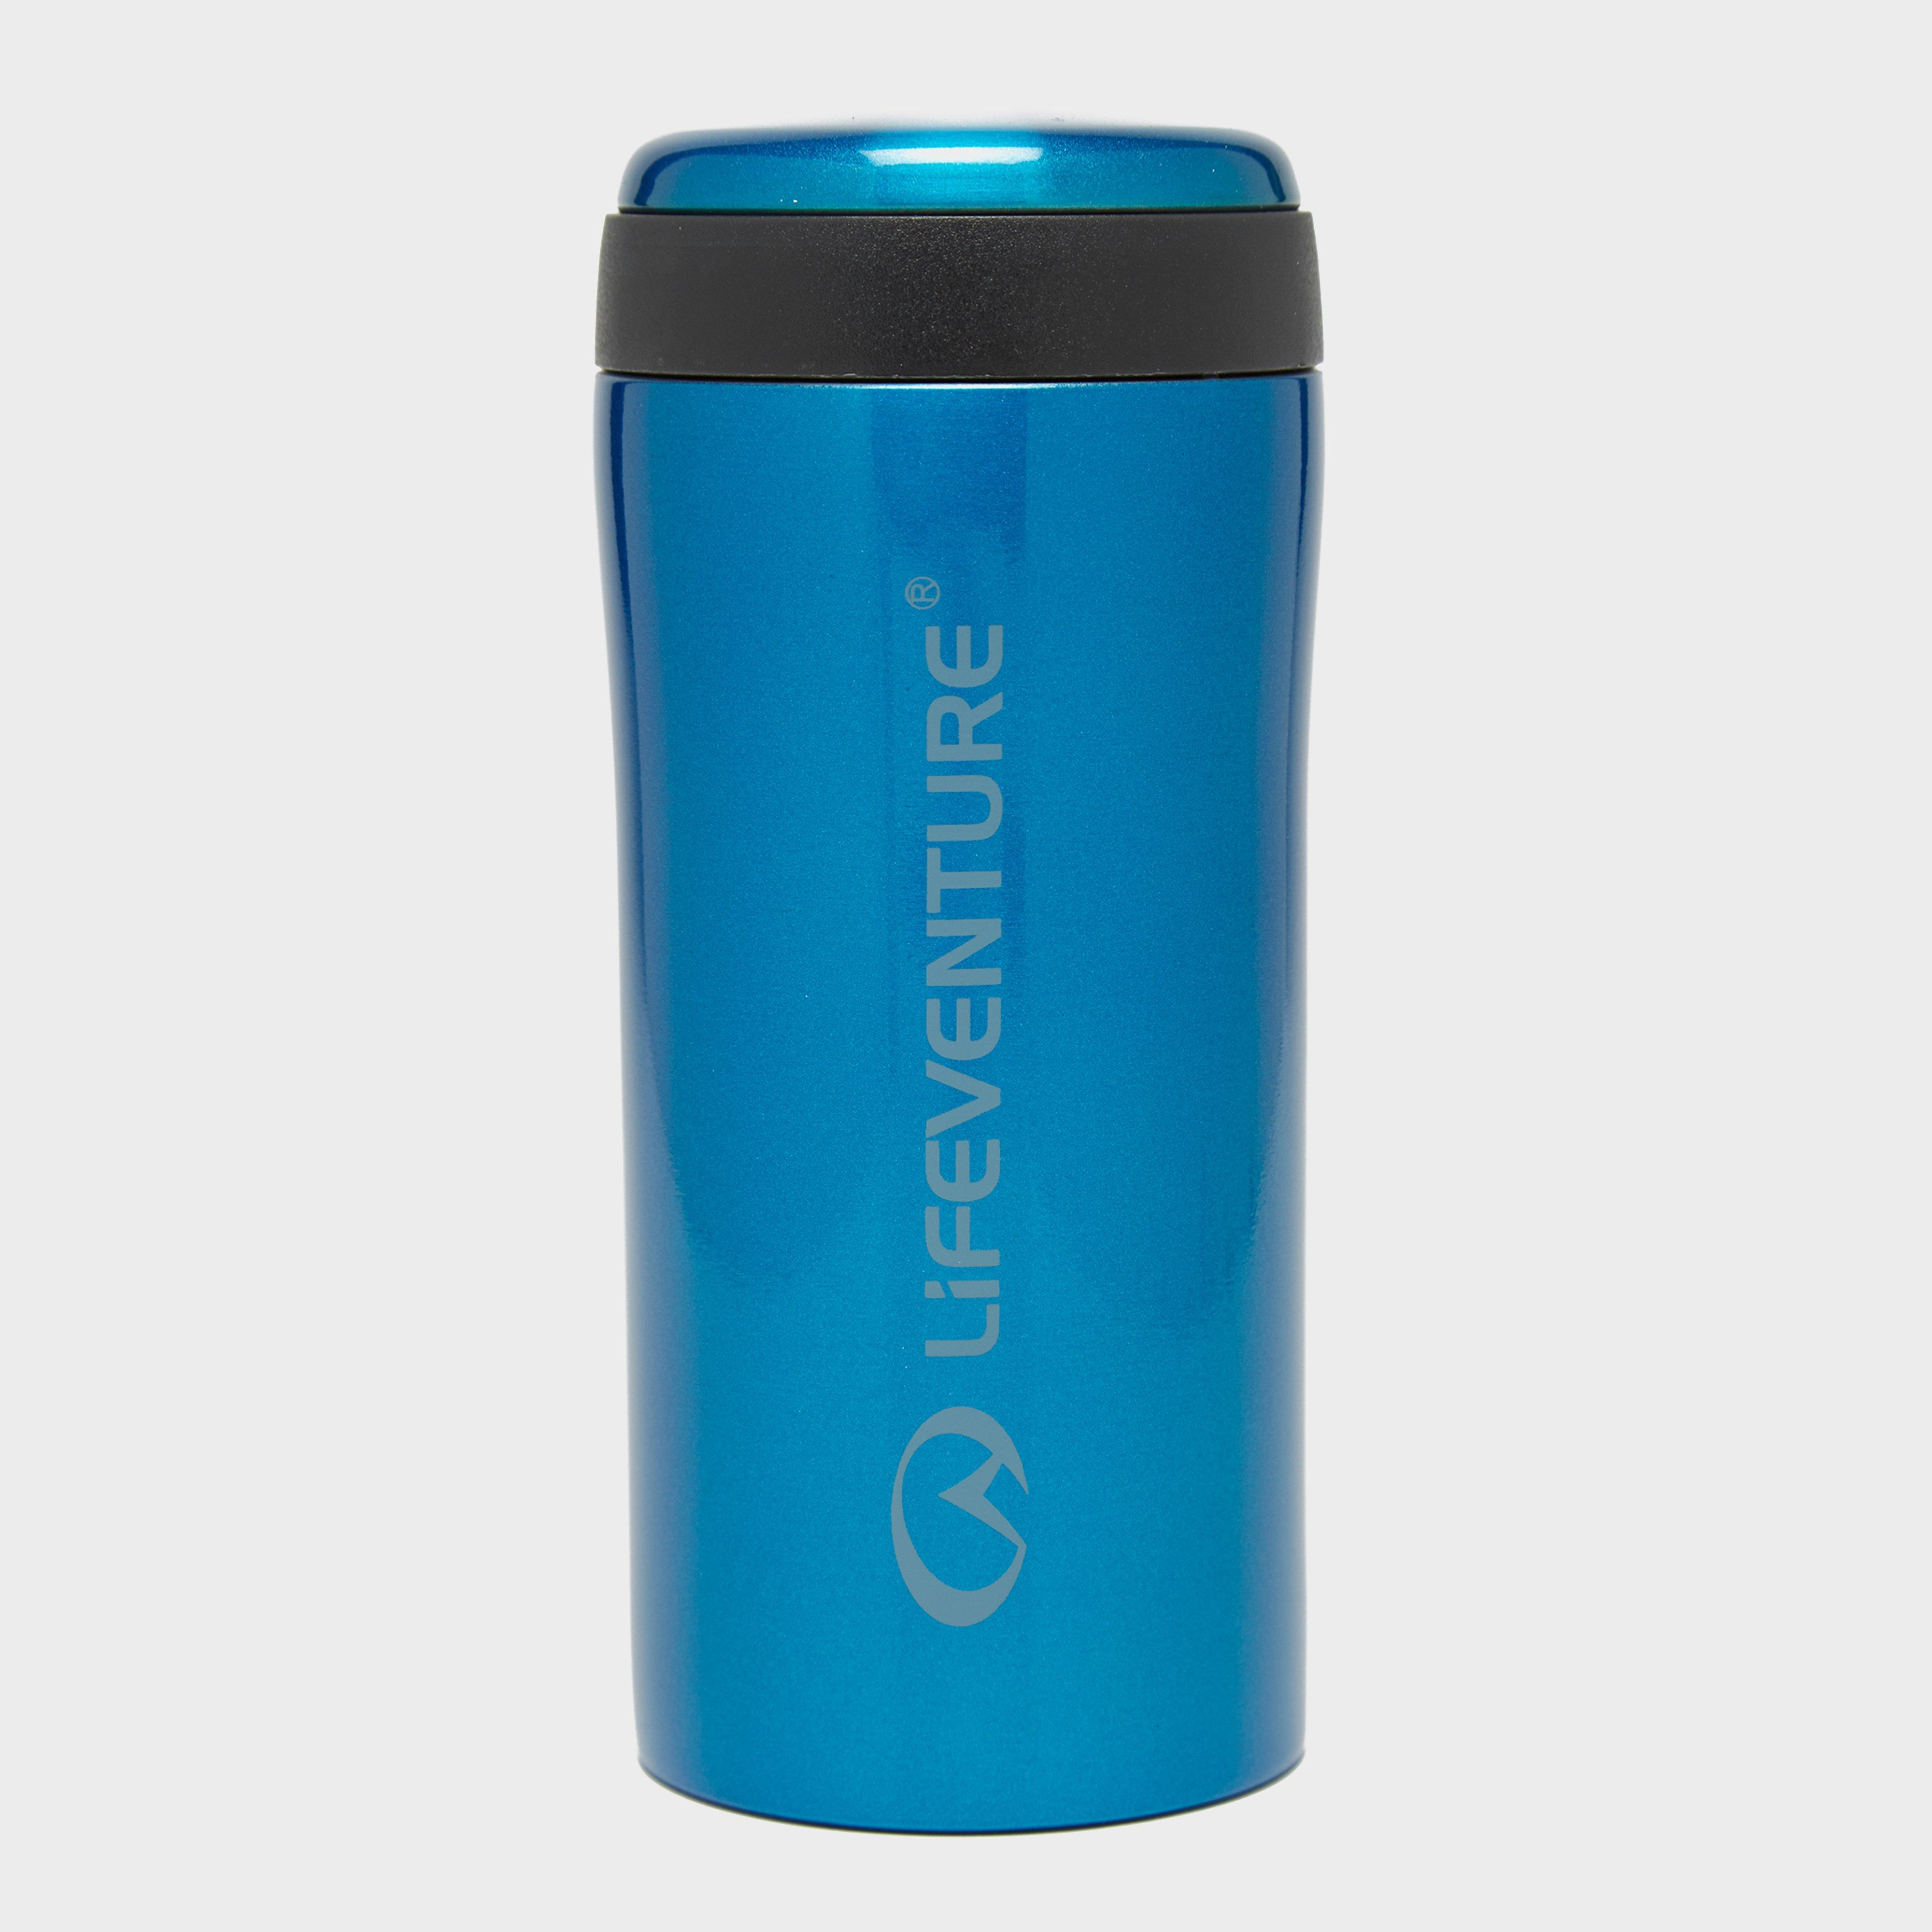 Lifeventure Lifeventure Thermal Mug - Blue, Blue